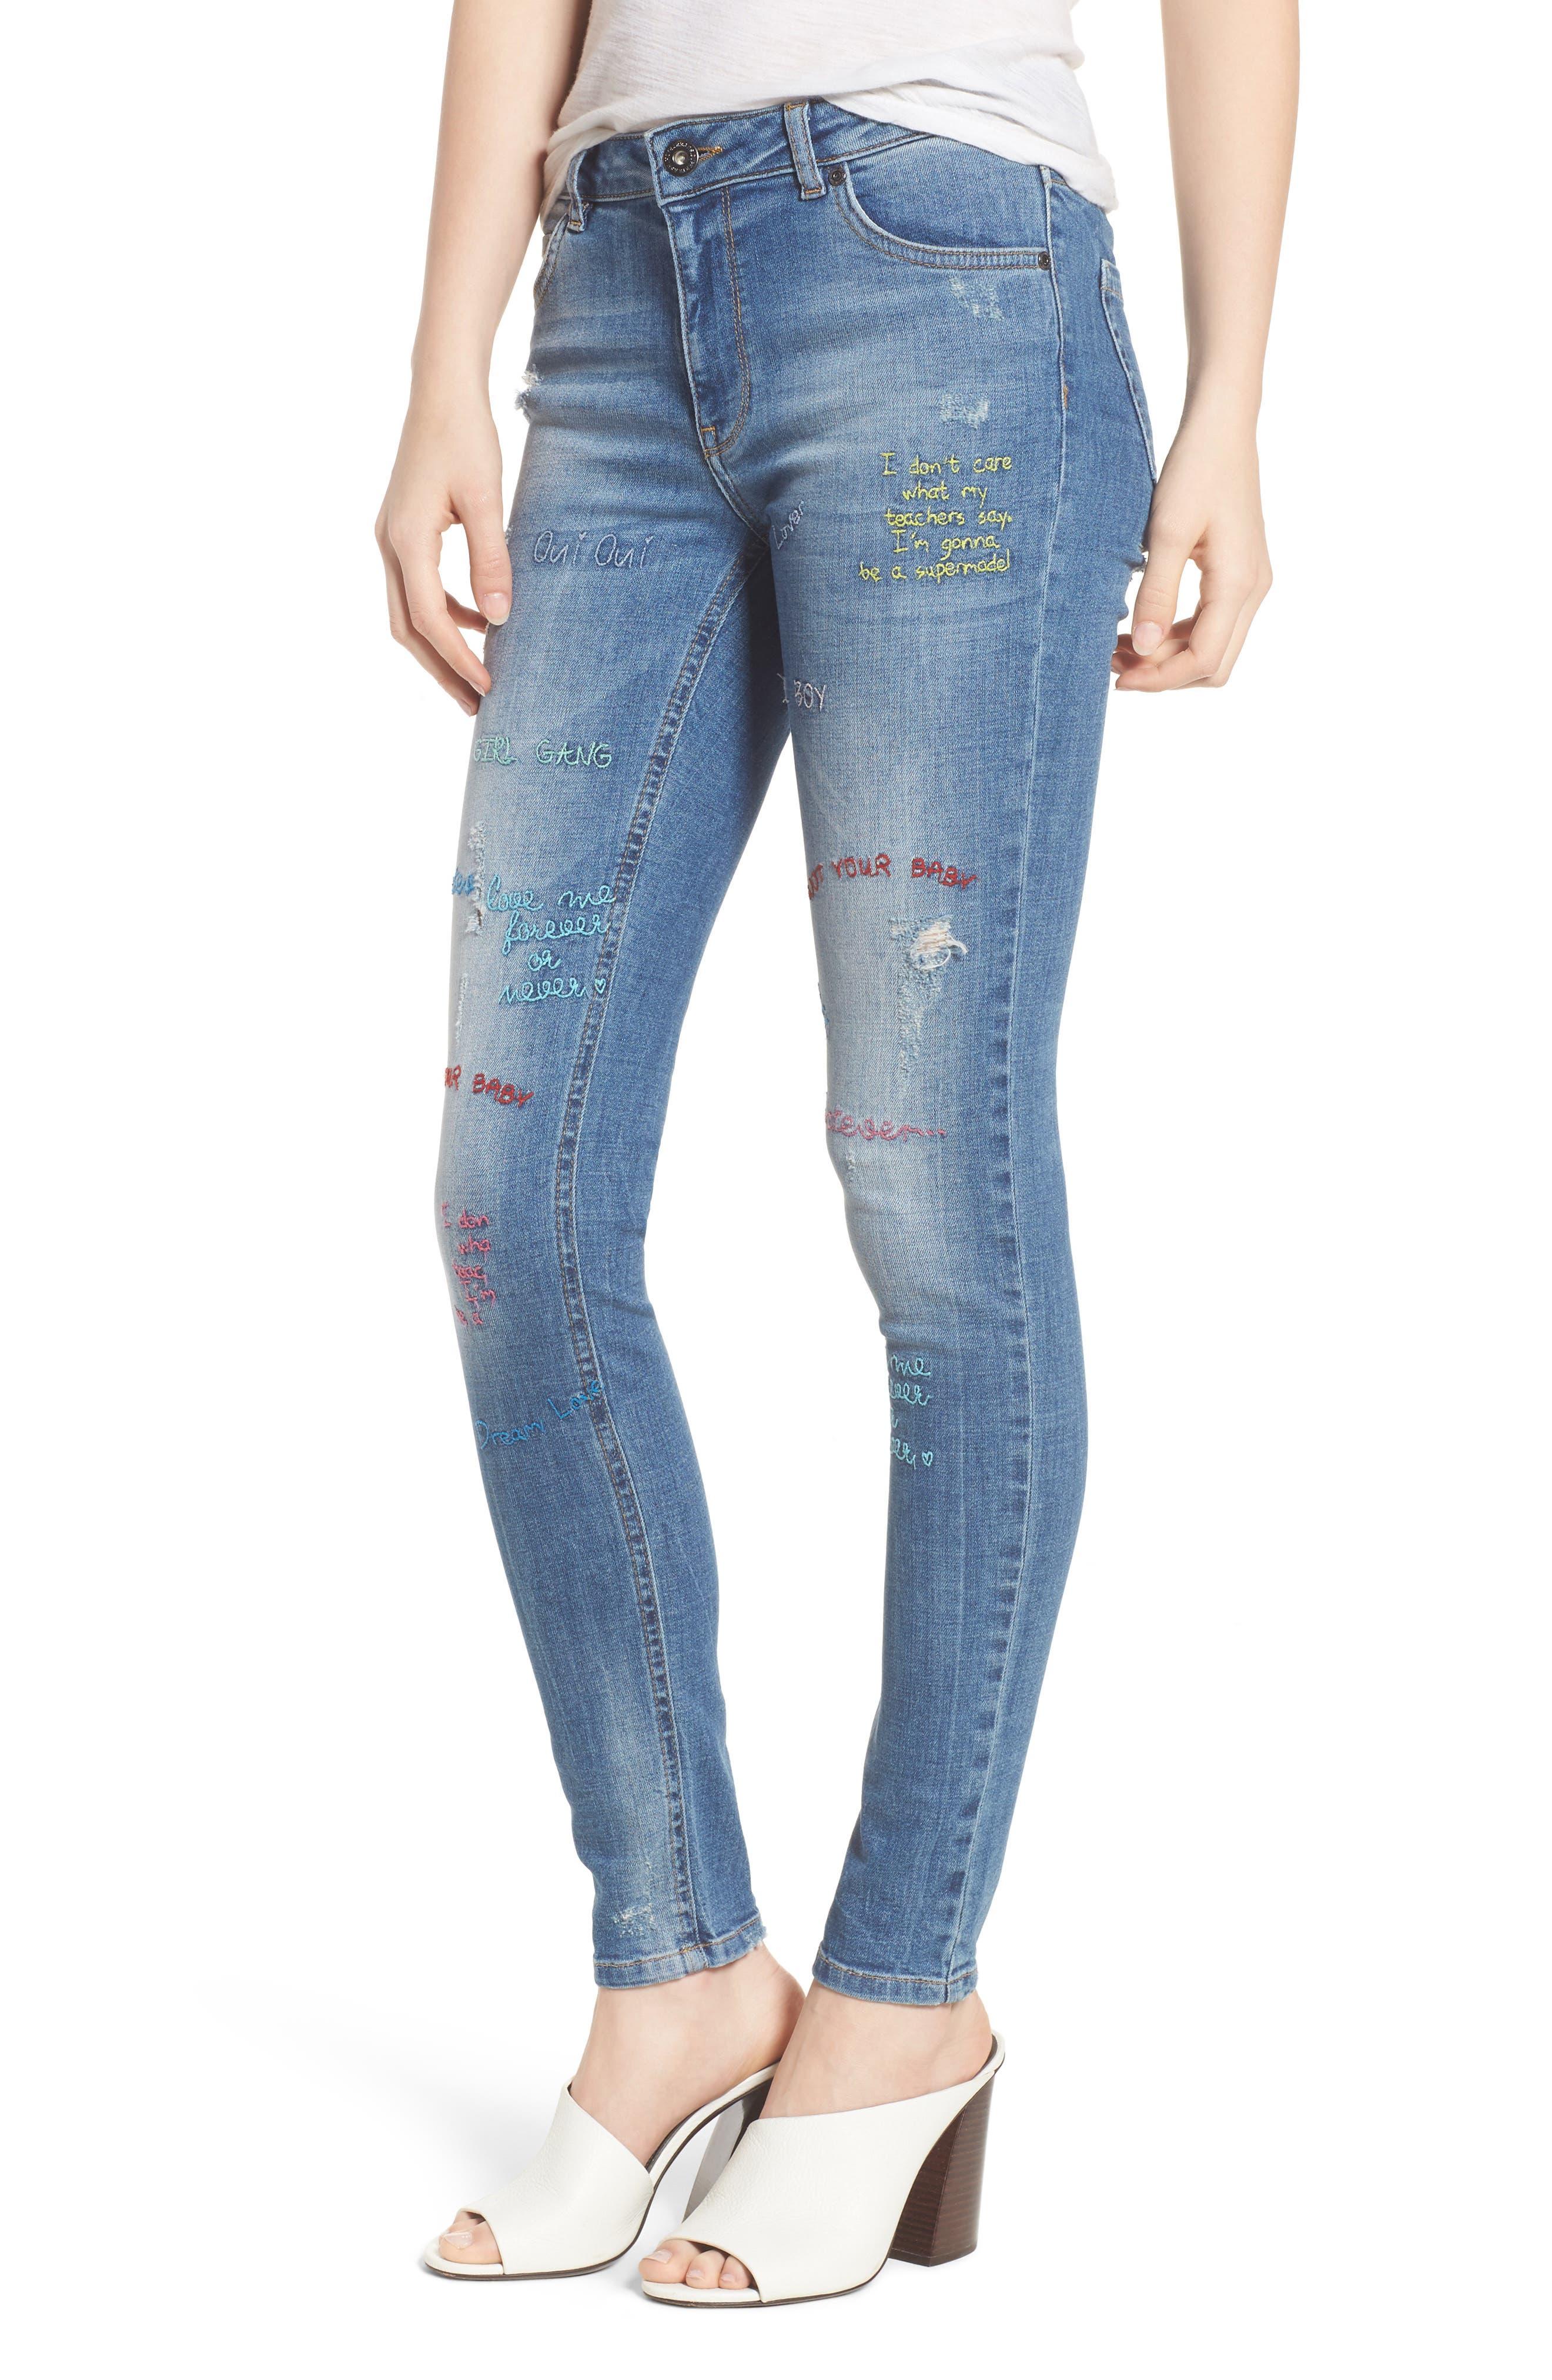 Paradise High Waist Skinny Jeans,                             Main thumbnail 1, color,                             Mid Blue